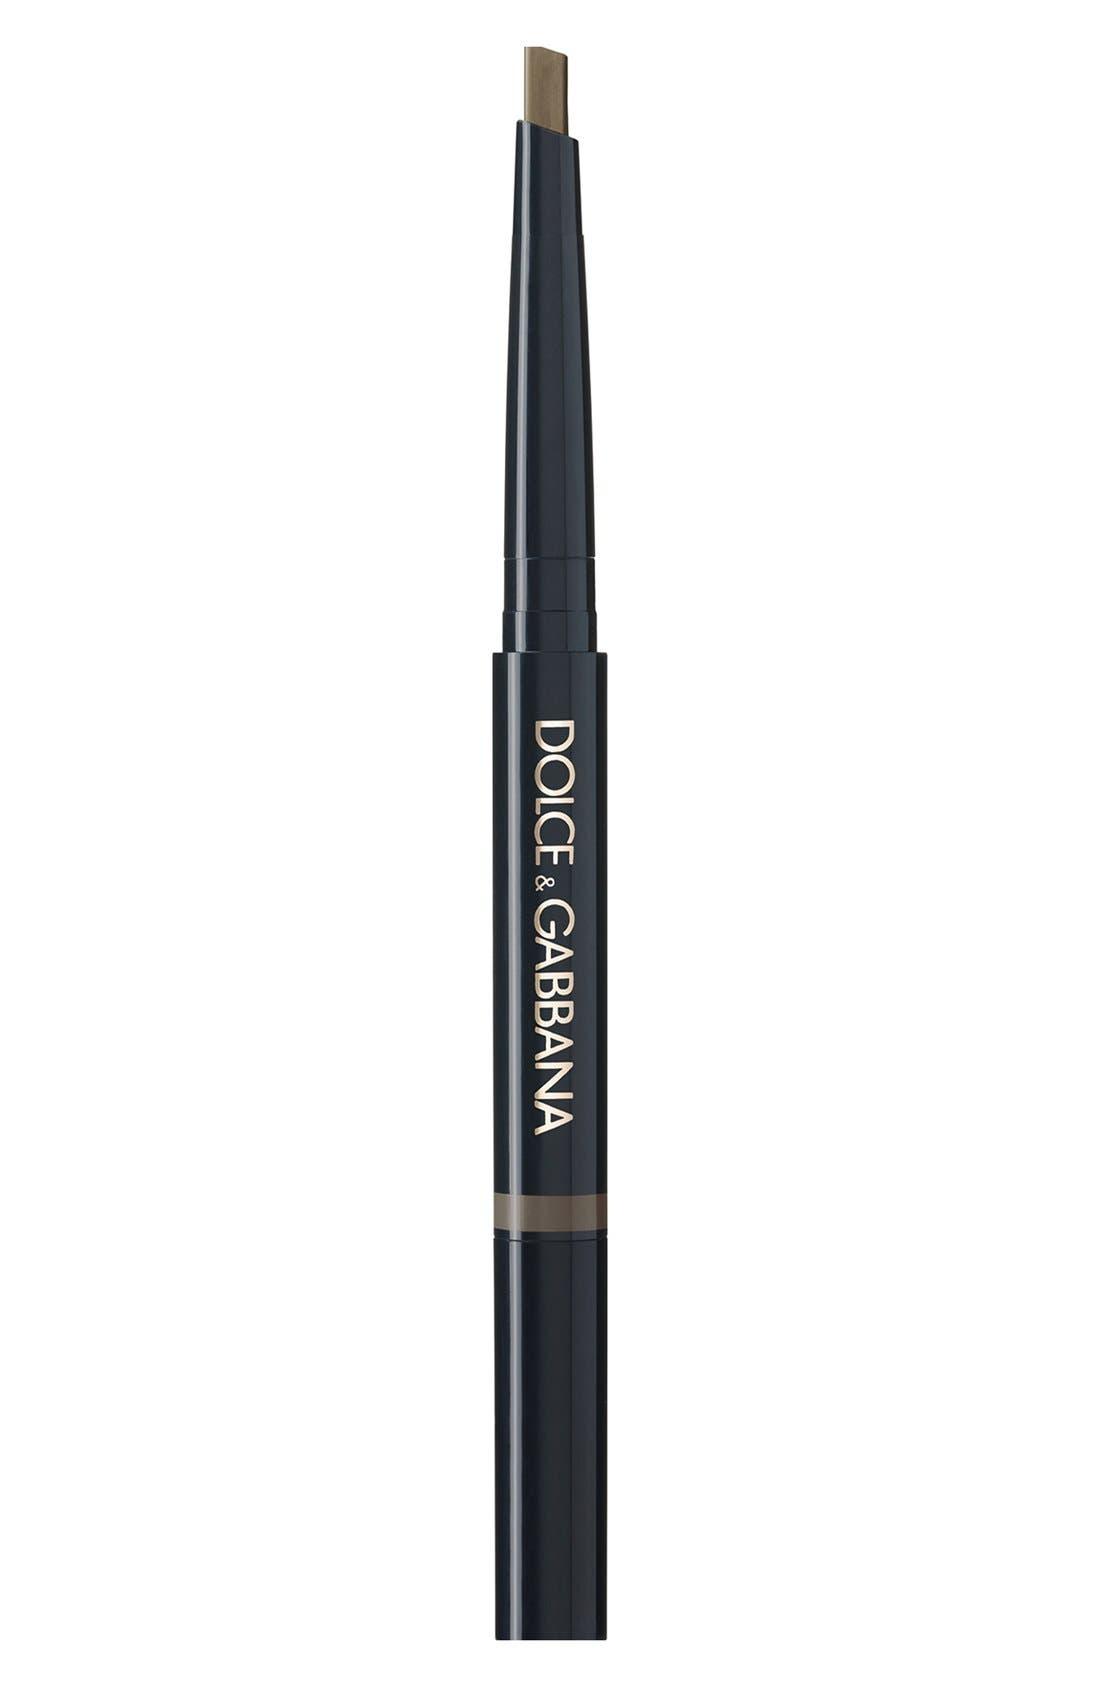 Dolce&Gabbana Beauty Shaping Eyebrow Pencil